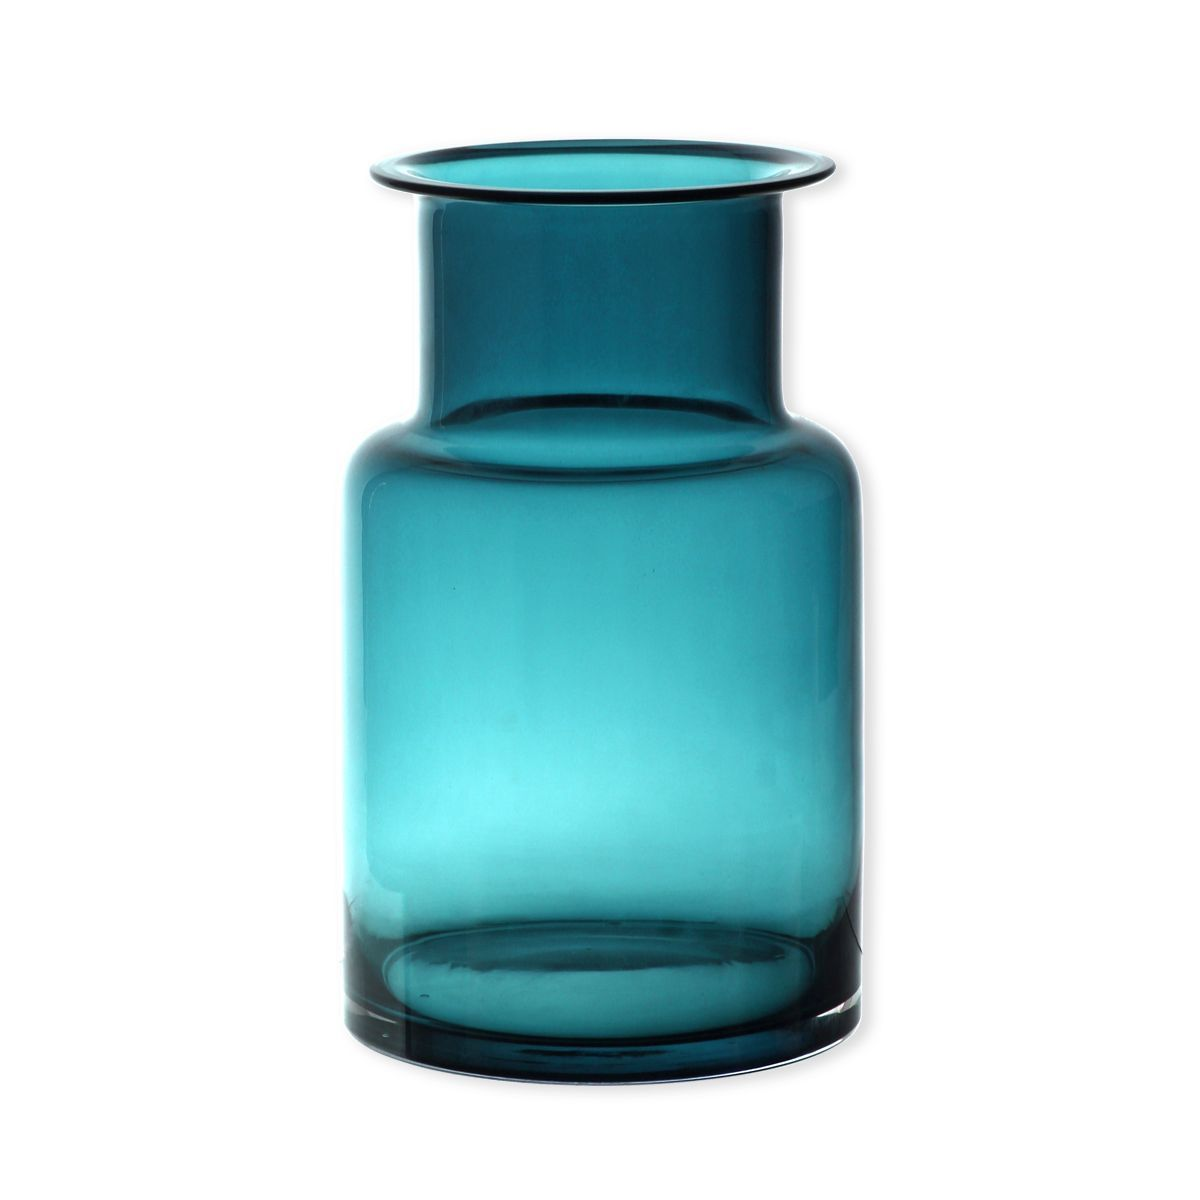 vase en verre turquoise forme bouteille pacific cm. Black Bedroom Furniture Sets. Home Design Ideas